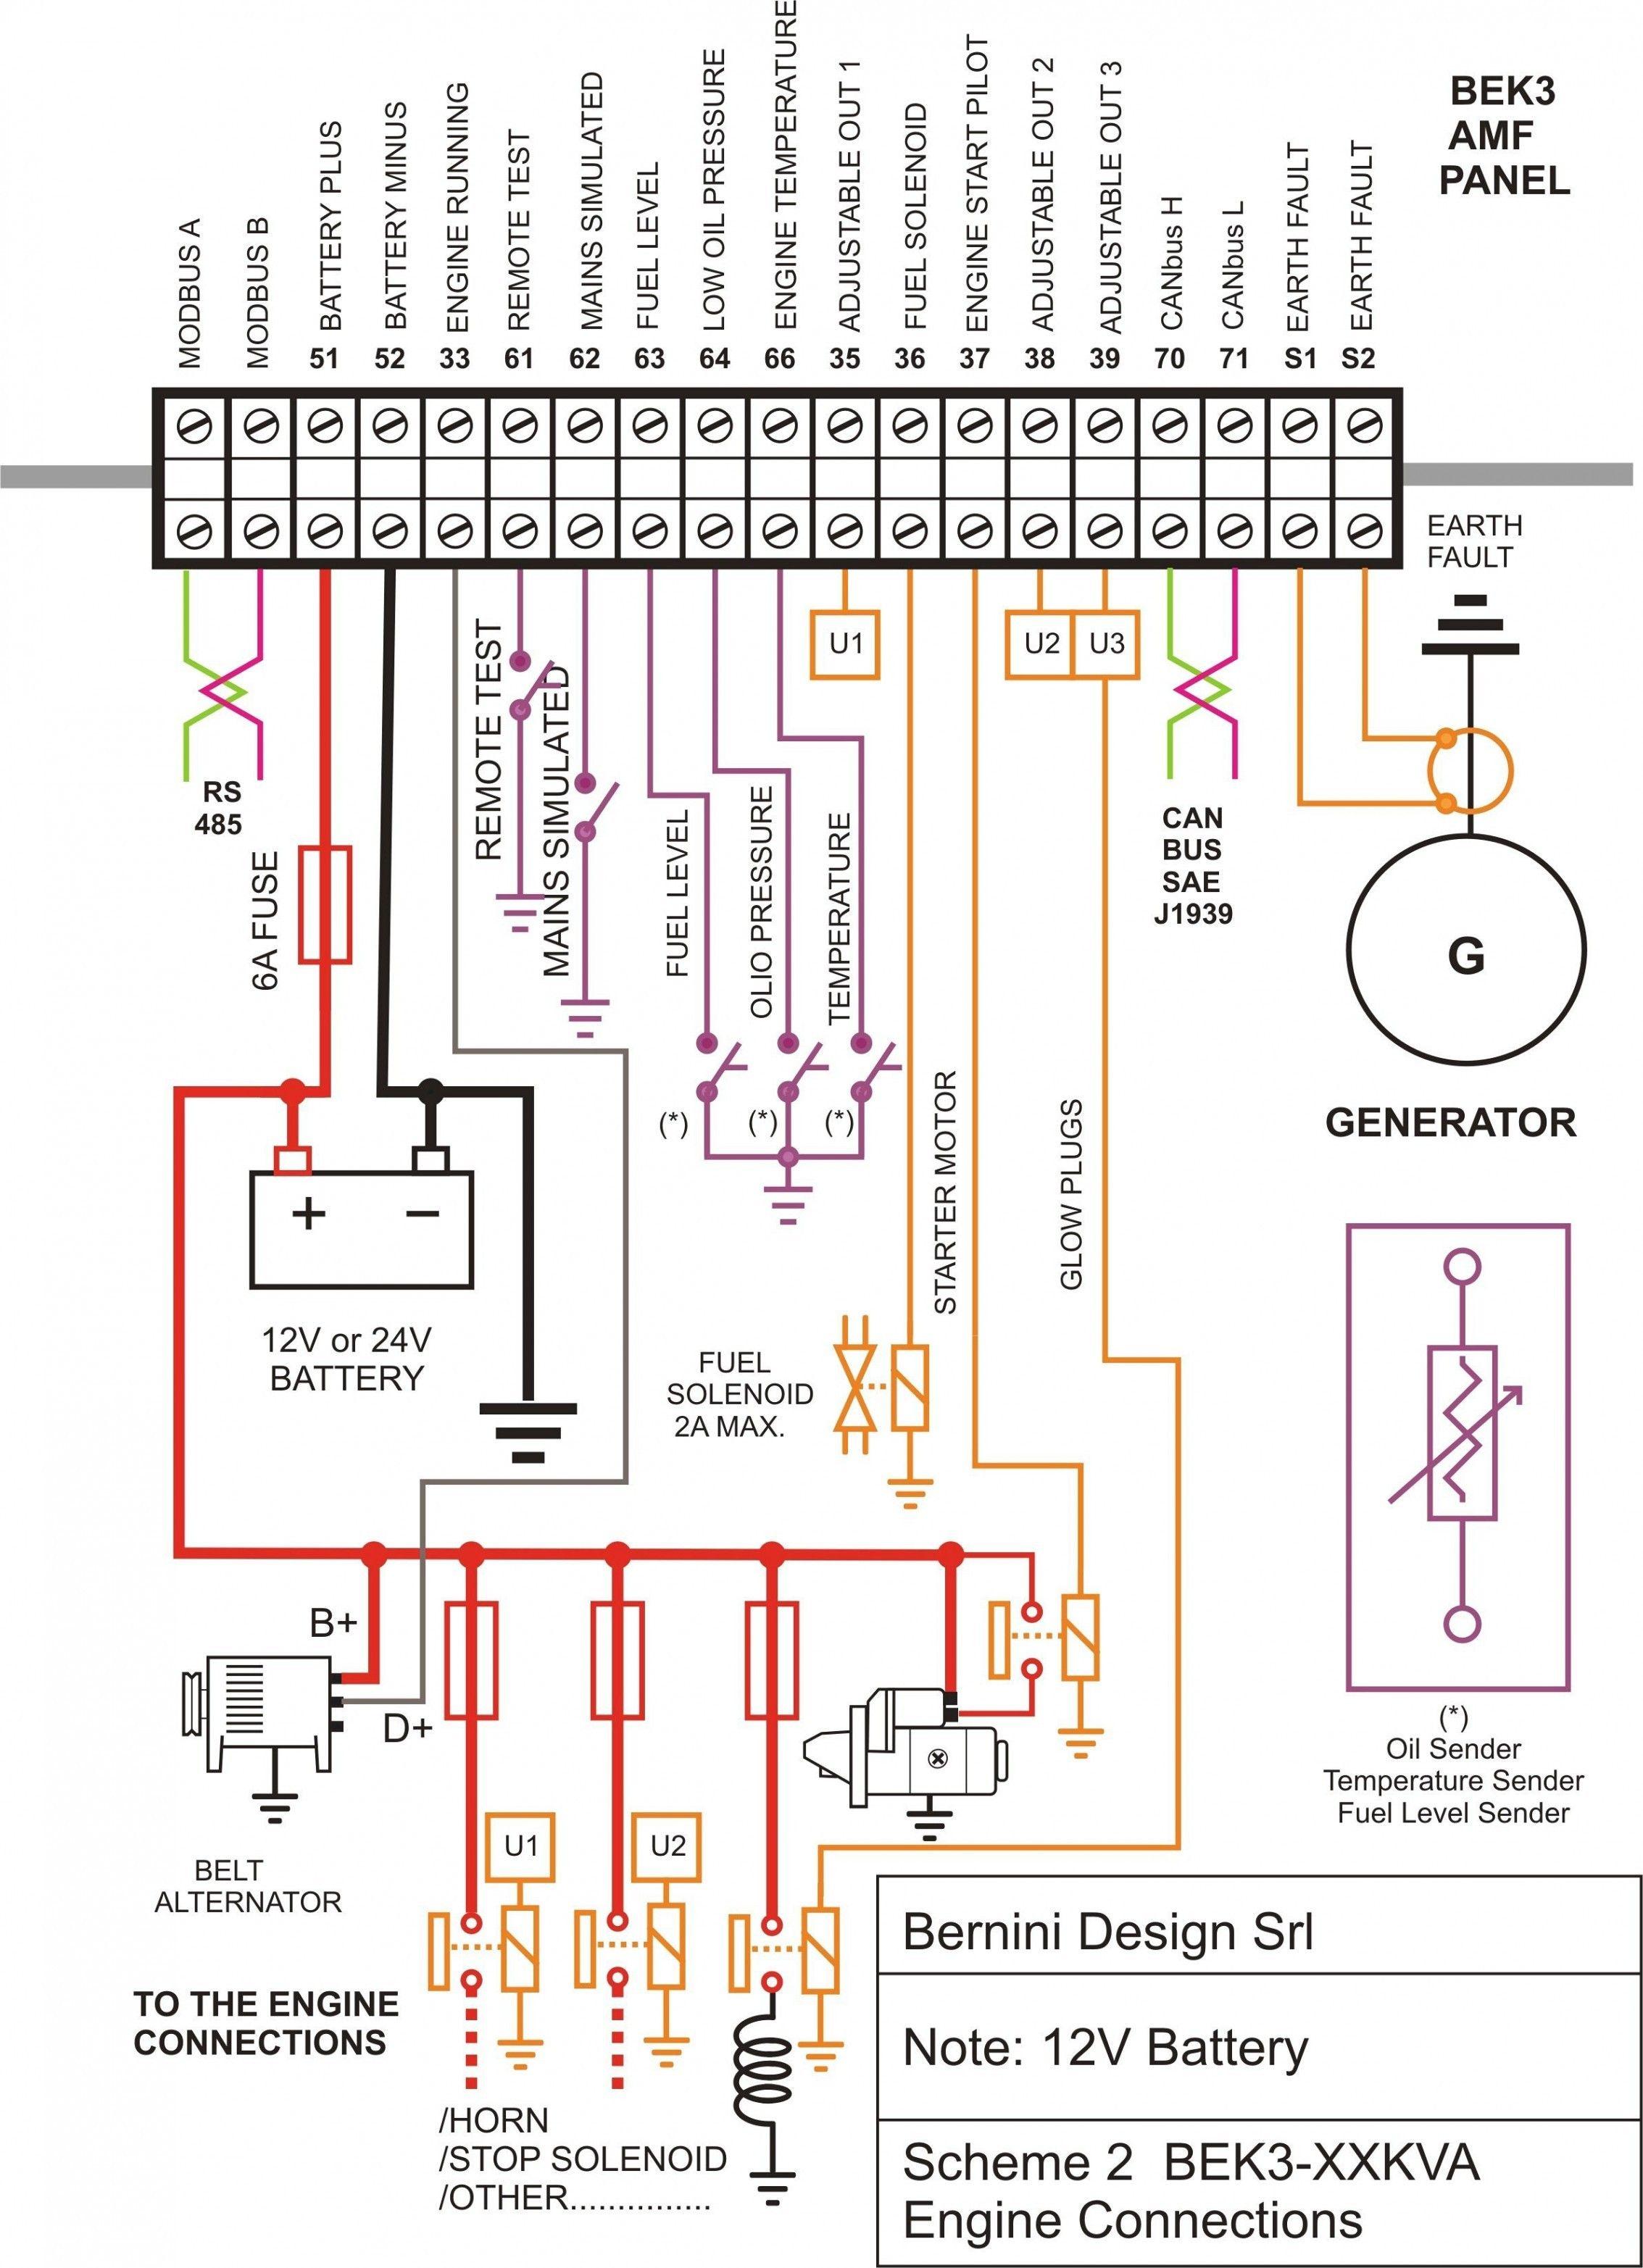 17 Innovative Circuit Diagram Ideas , https://bacamajalah.com/17-innovative- circuit-diagra… | Electrical circuit diagram, Electrical wiring diagram, Circuit  diagramPinterest